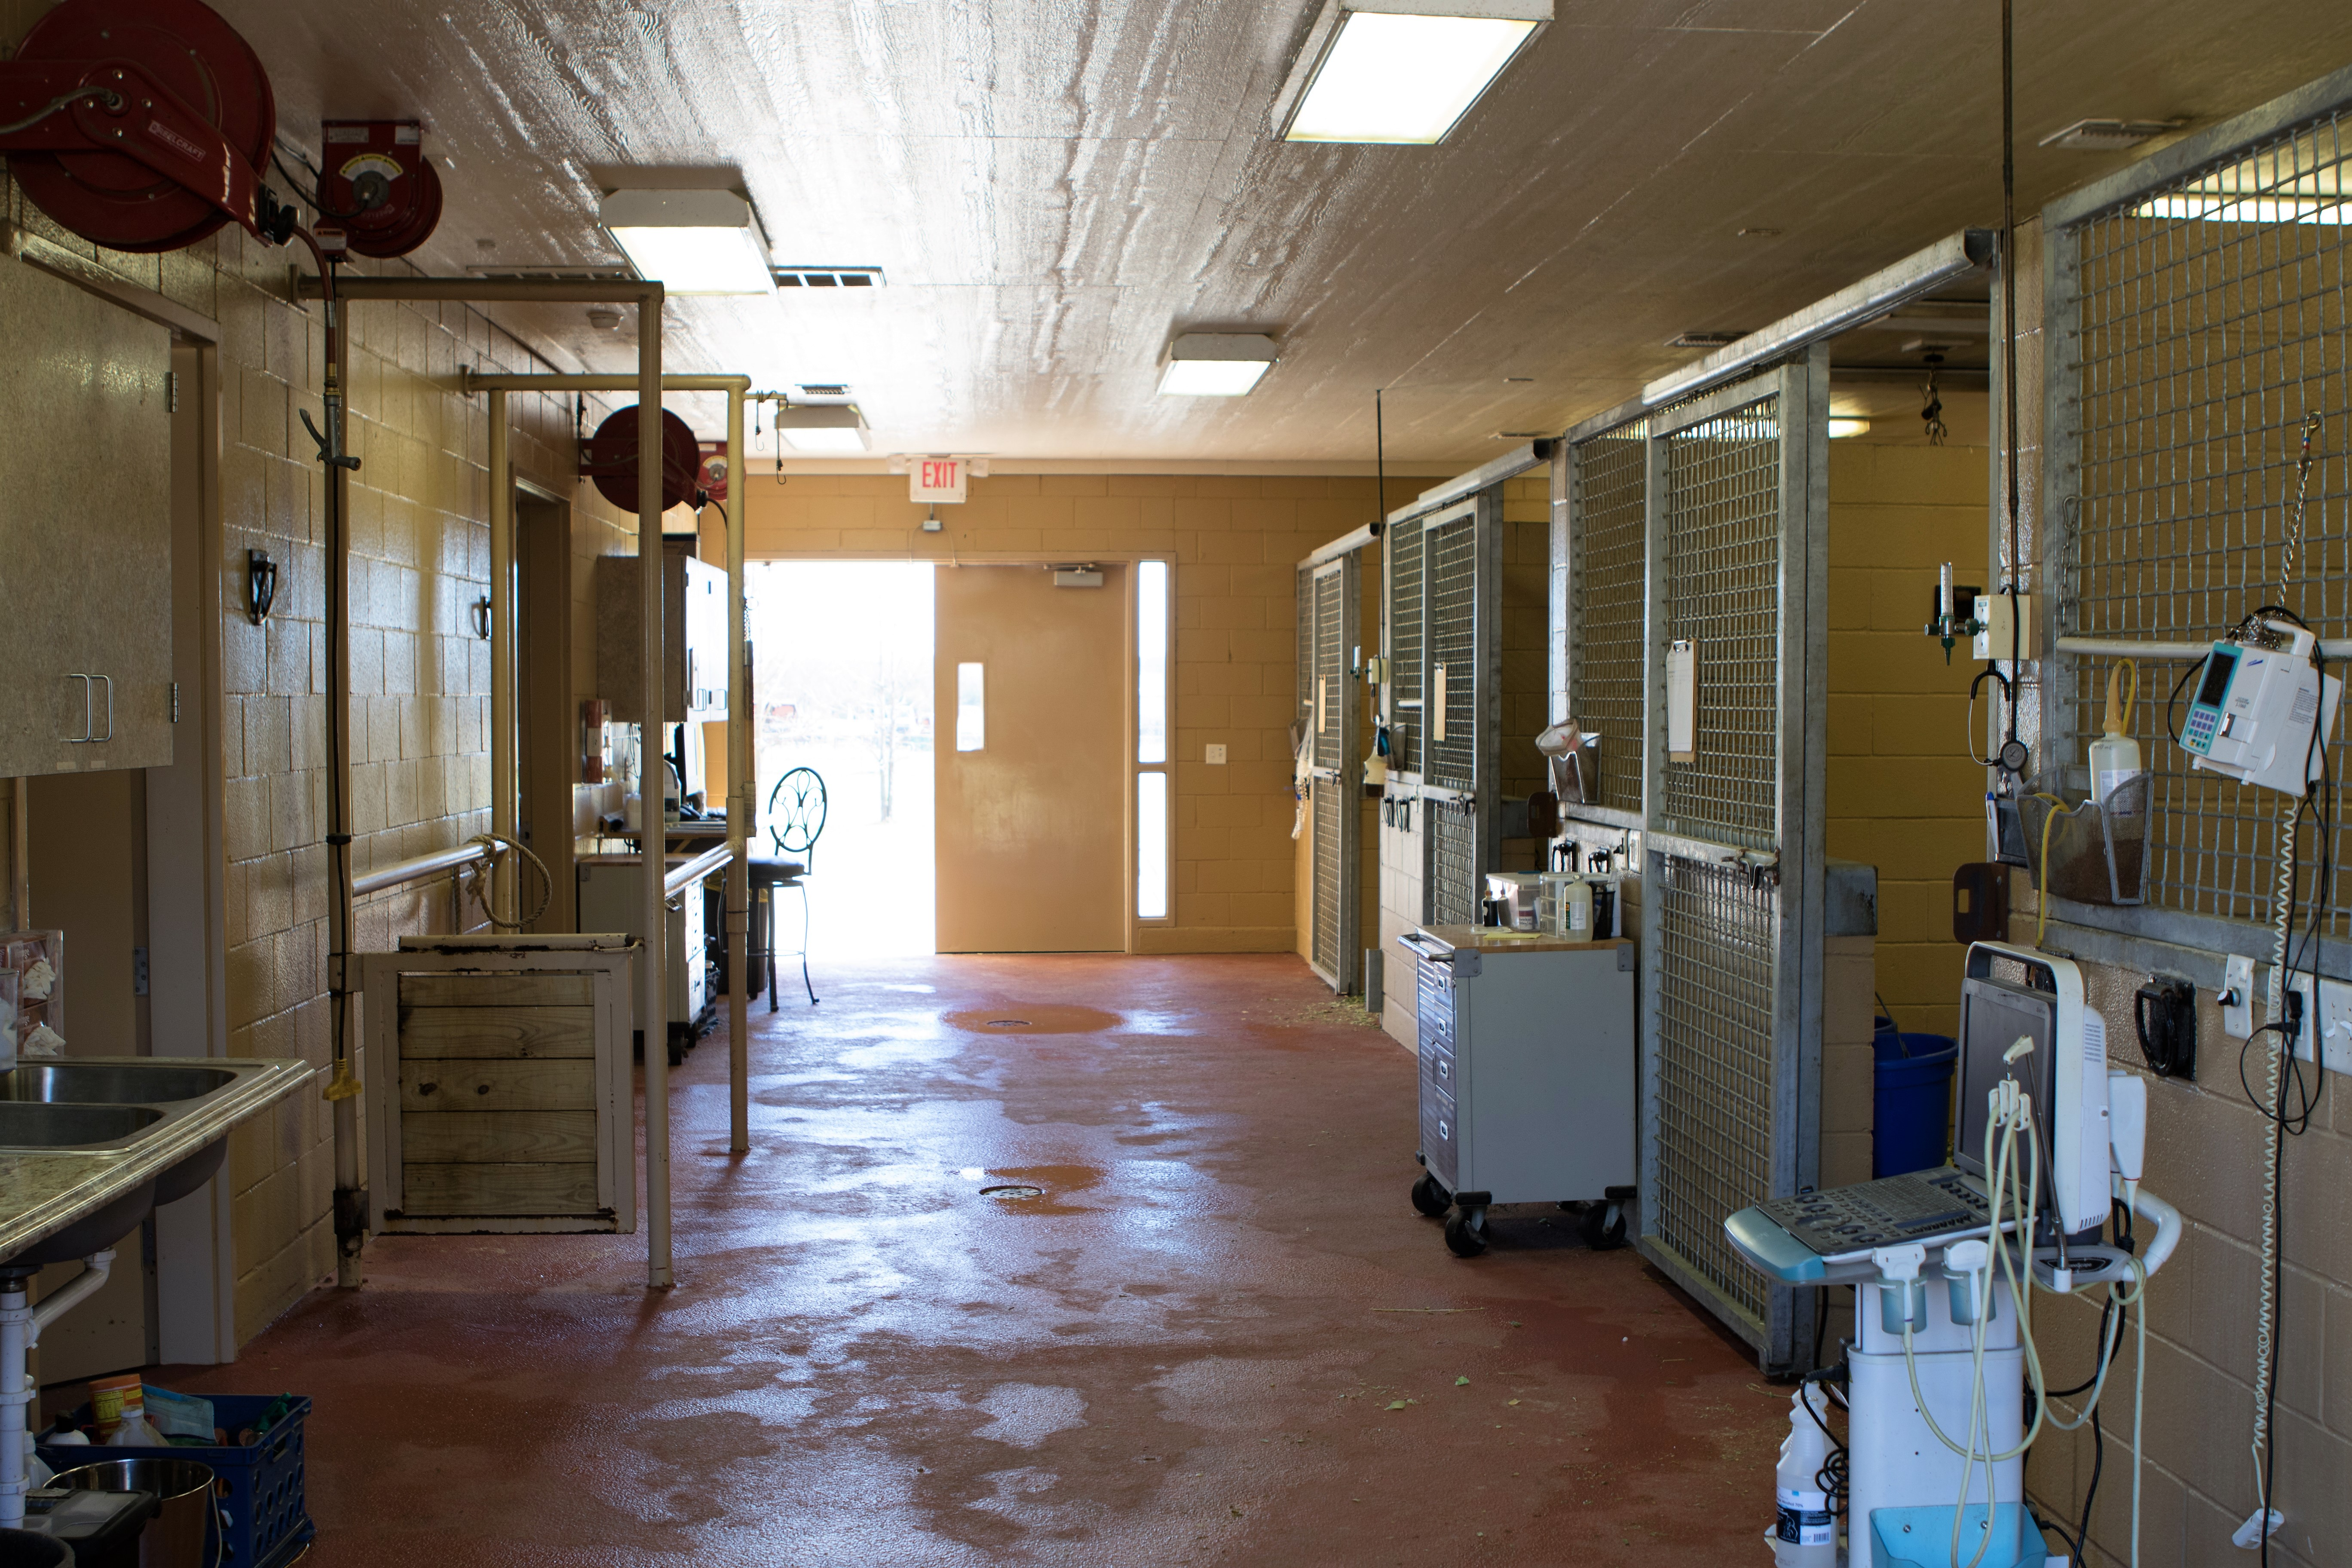 ICU Stalls